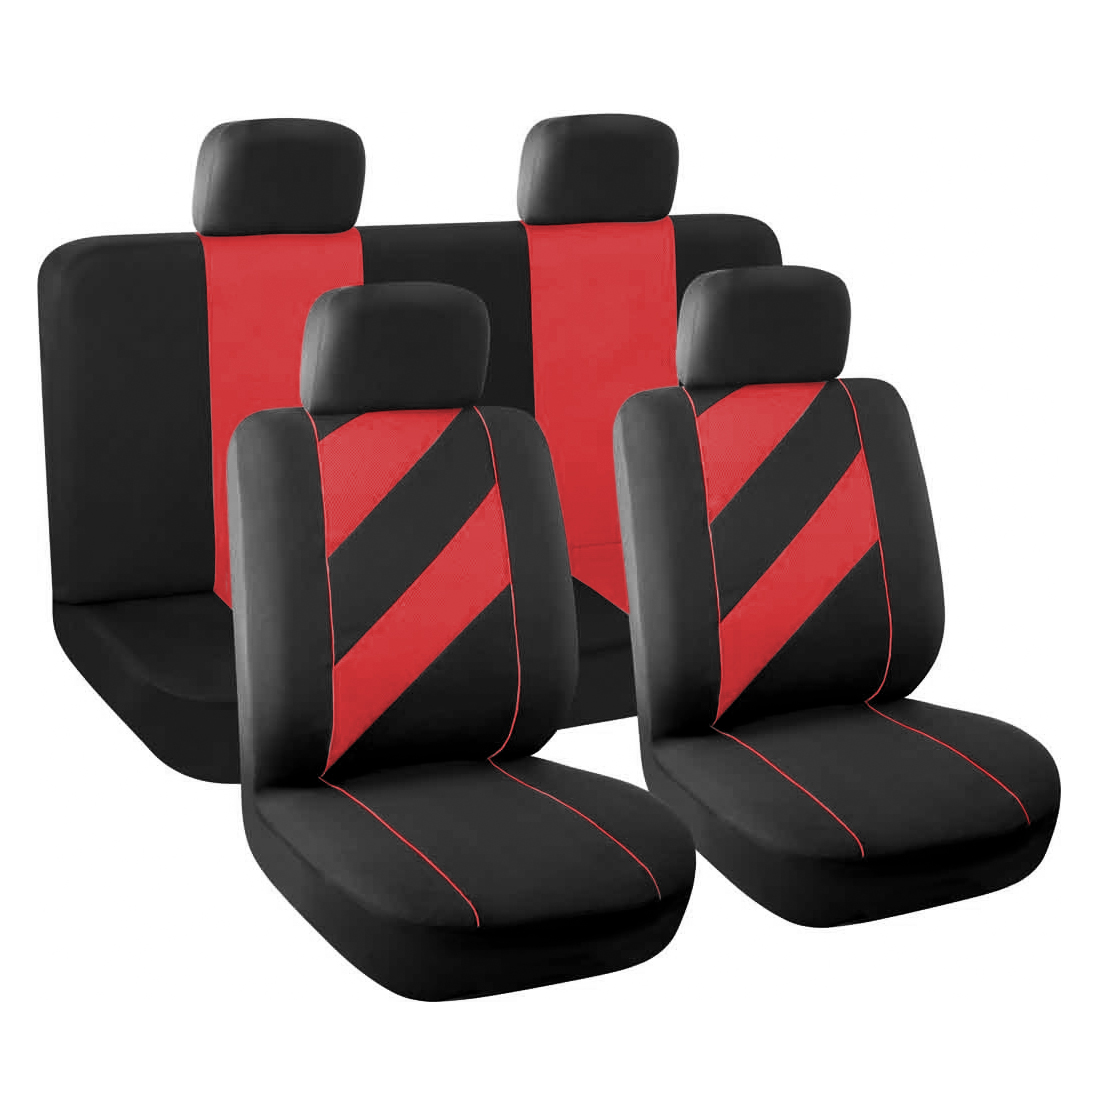 8 Piece x Unique Flat Cloth Auto Car Seat Cover Headrests Full set Red